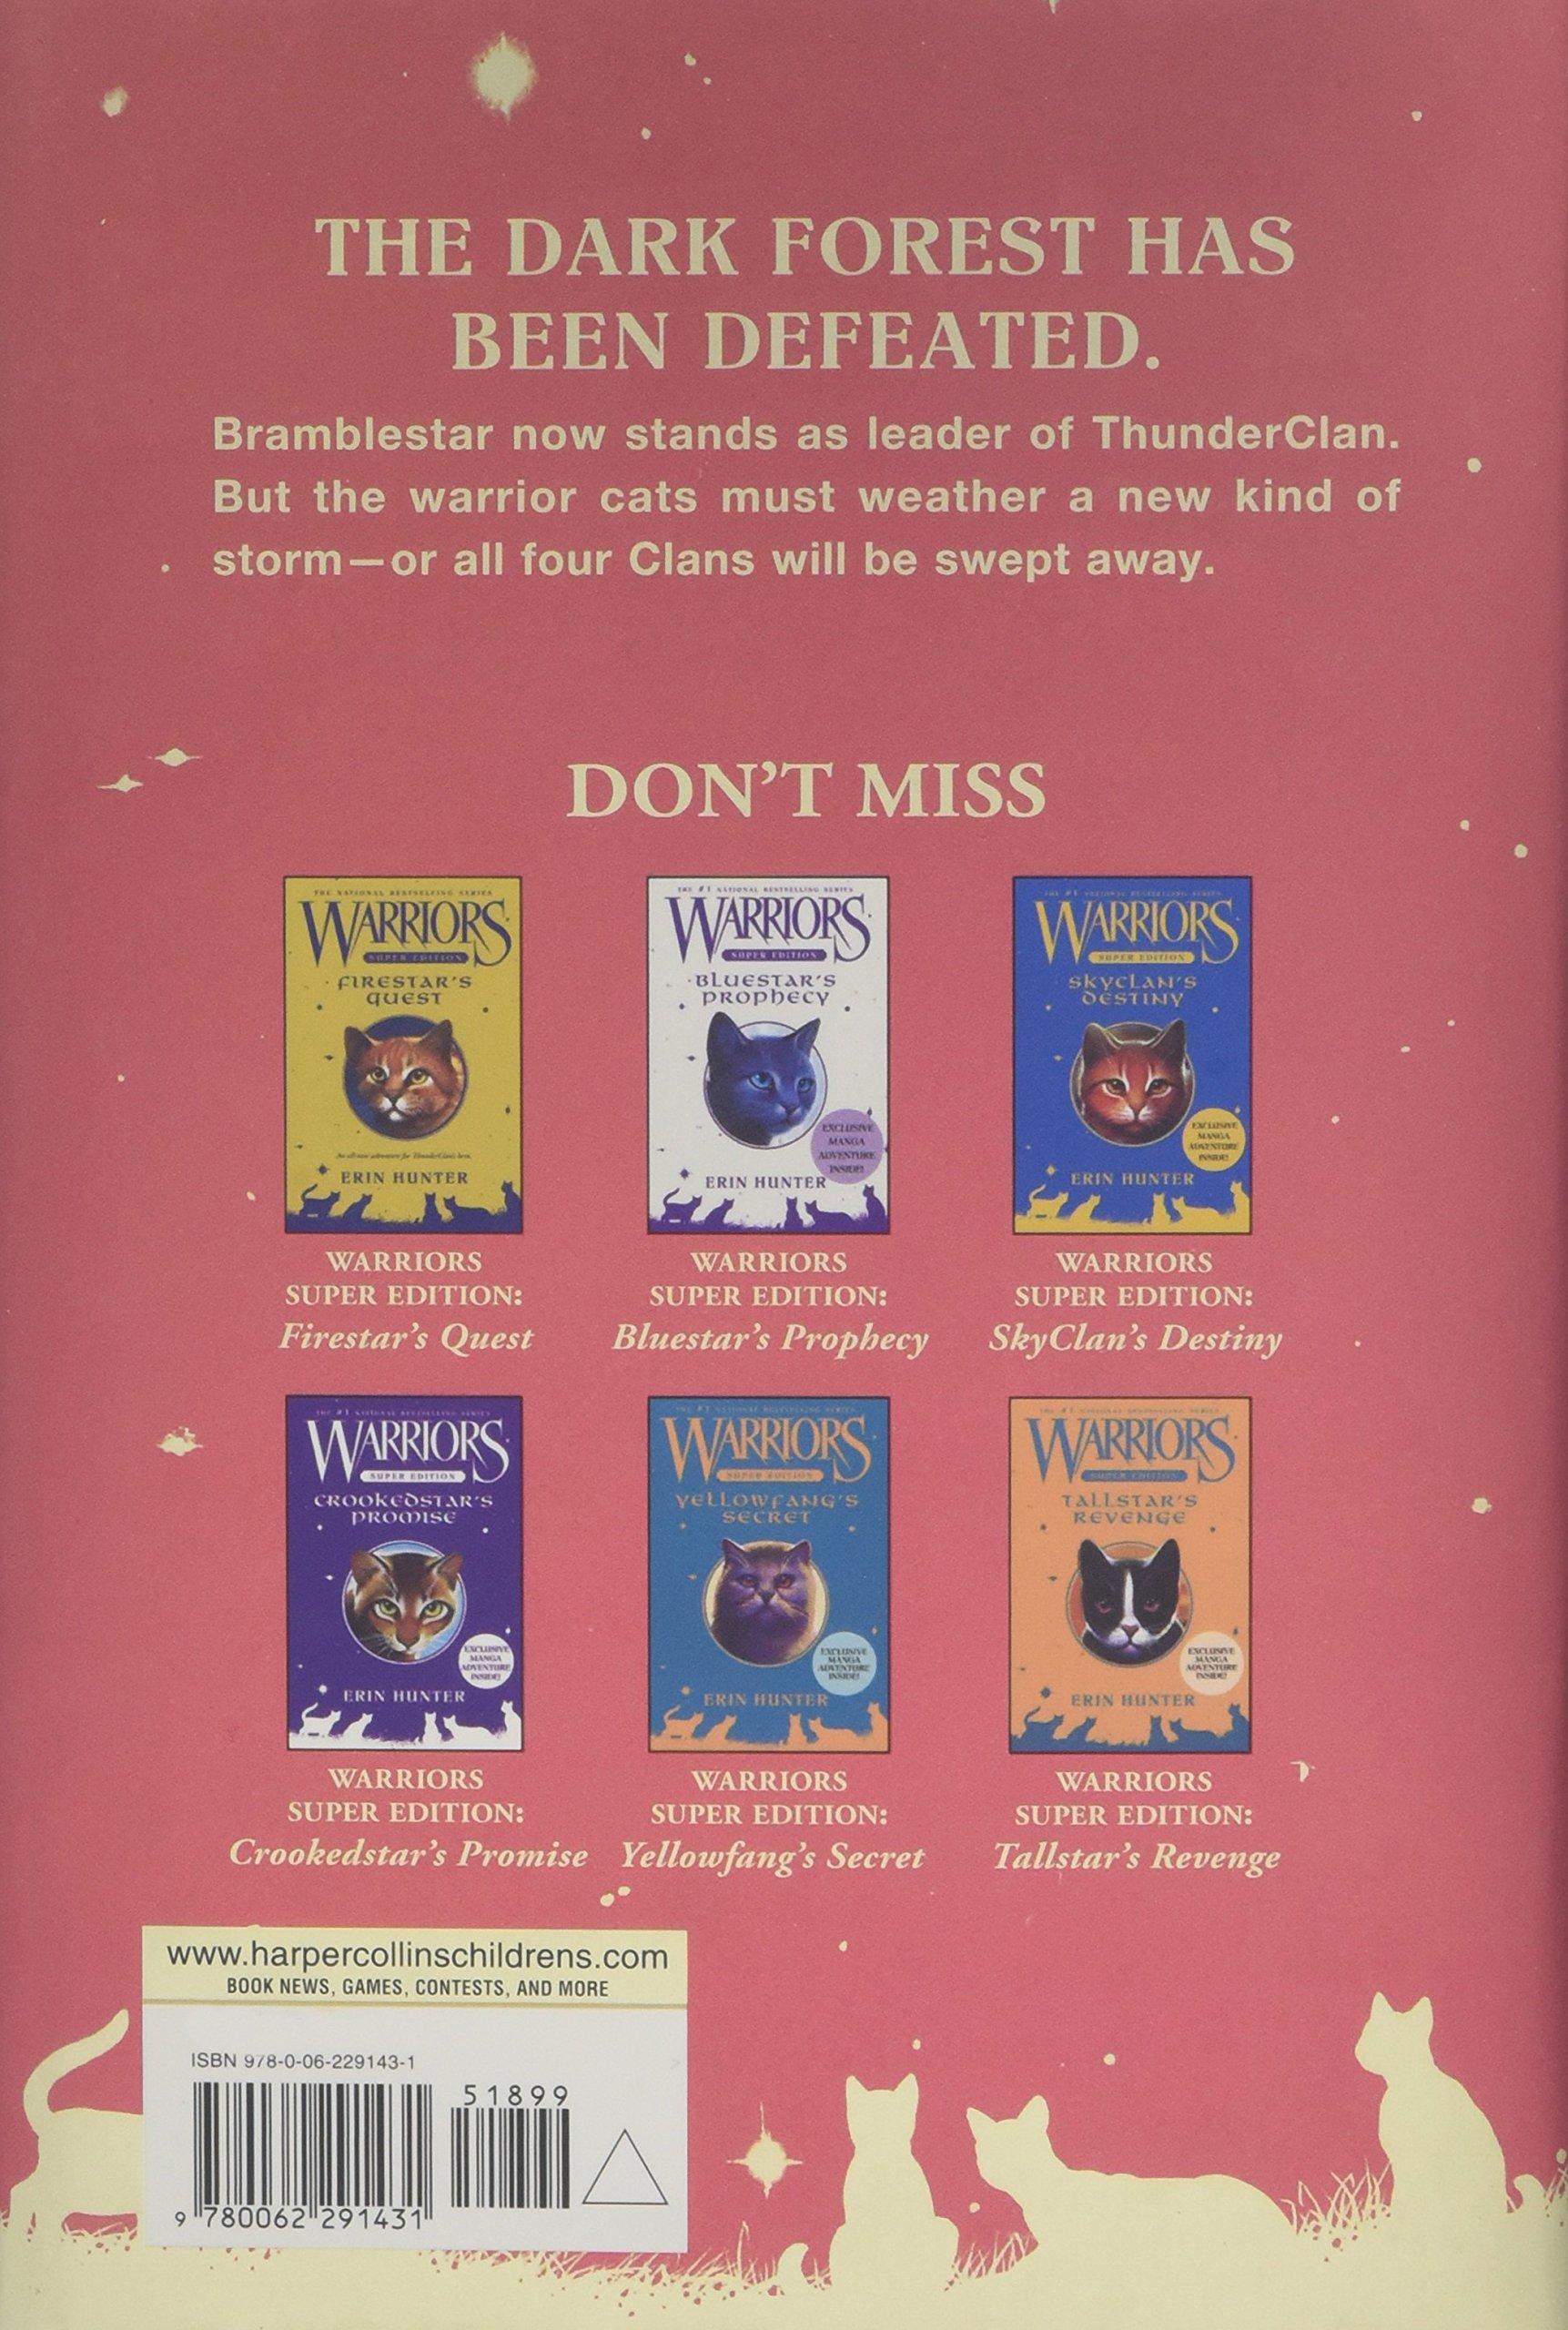 Warriors Super Edition: Bramblestar's Storm: Amazon: Erin Hunter:  9780062291431: Books